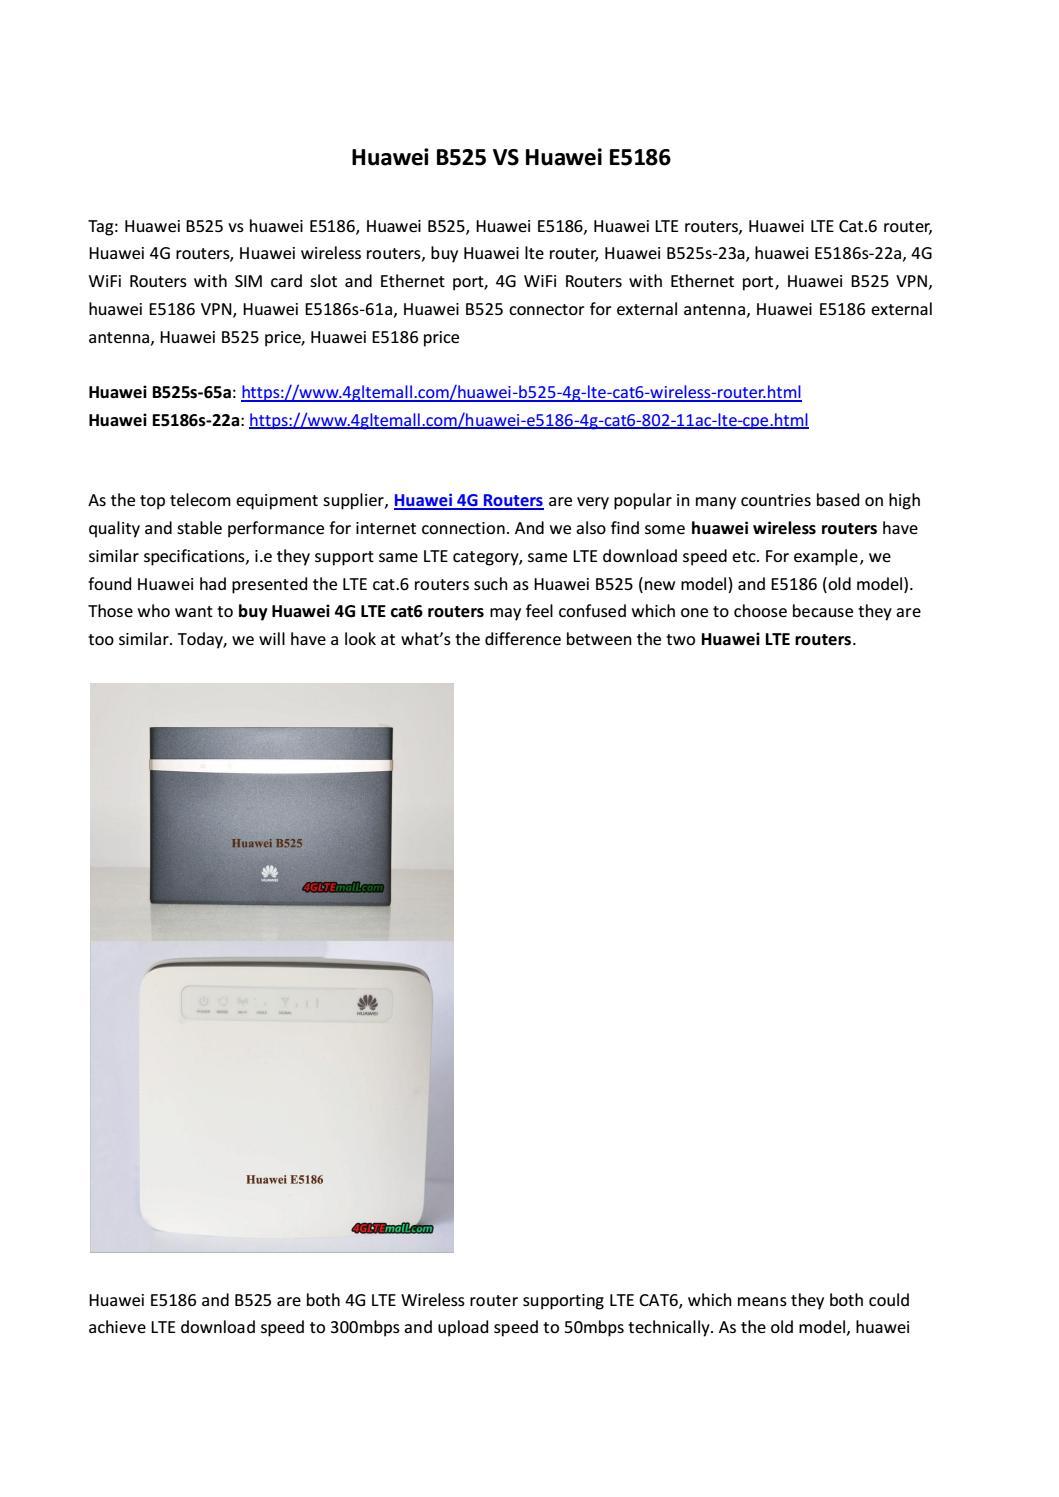 Huawei B525 VS Huawei E5186 by Lte Mall - issuu